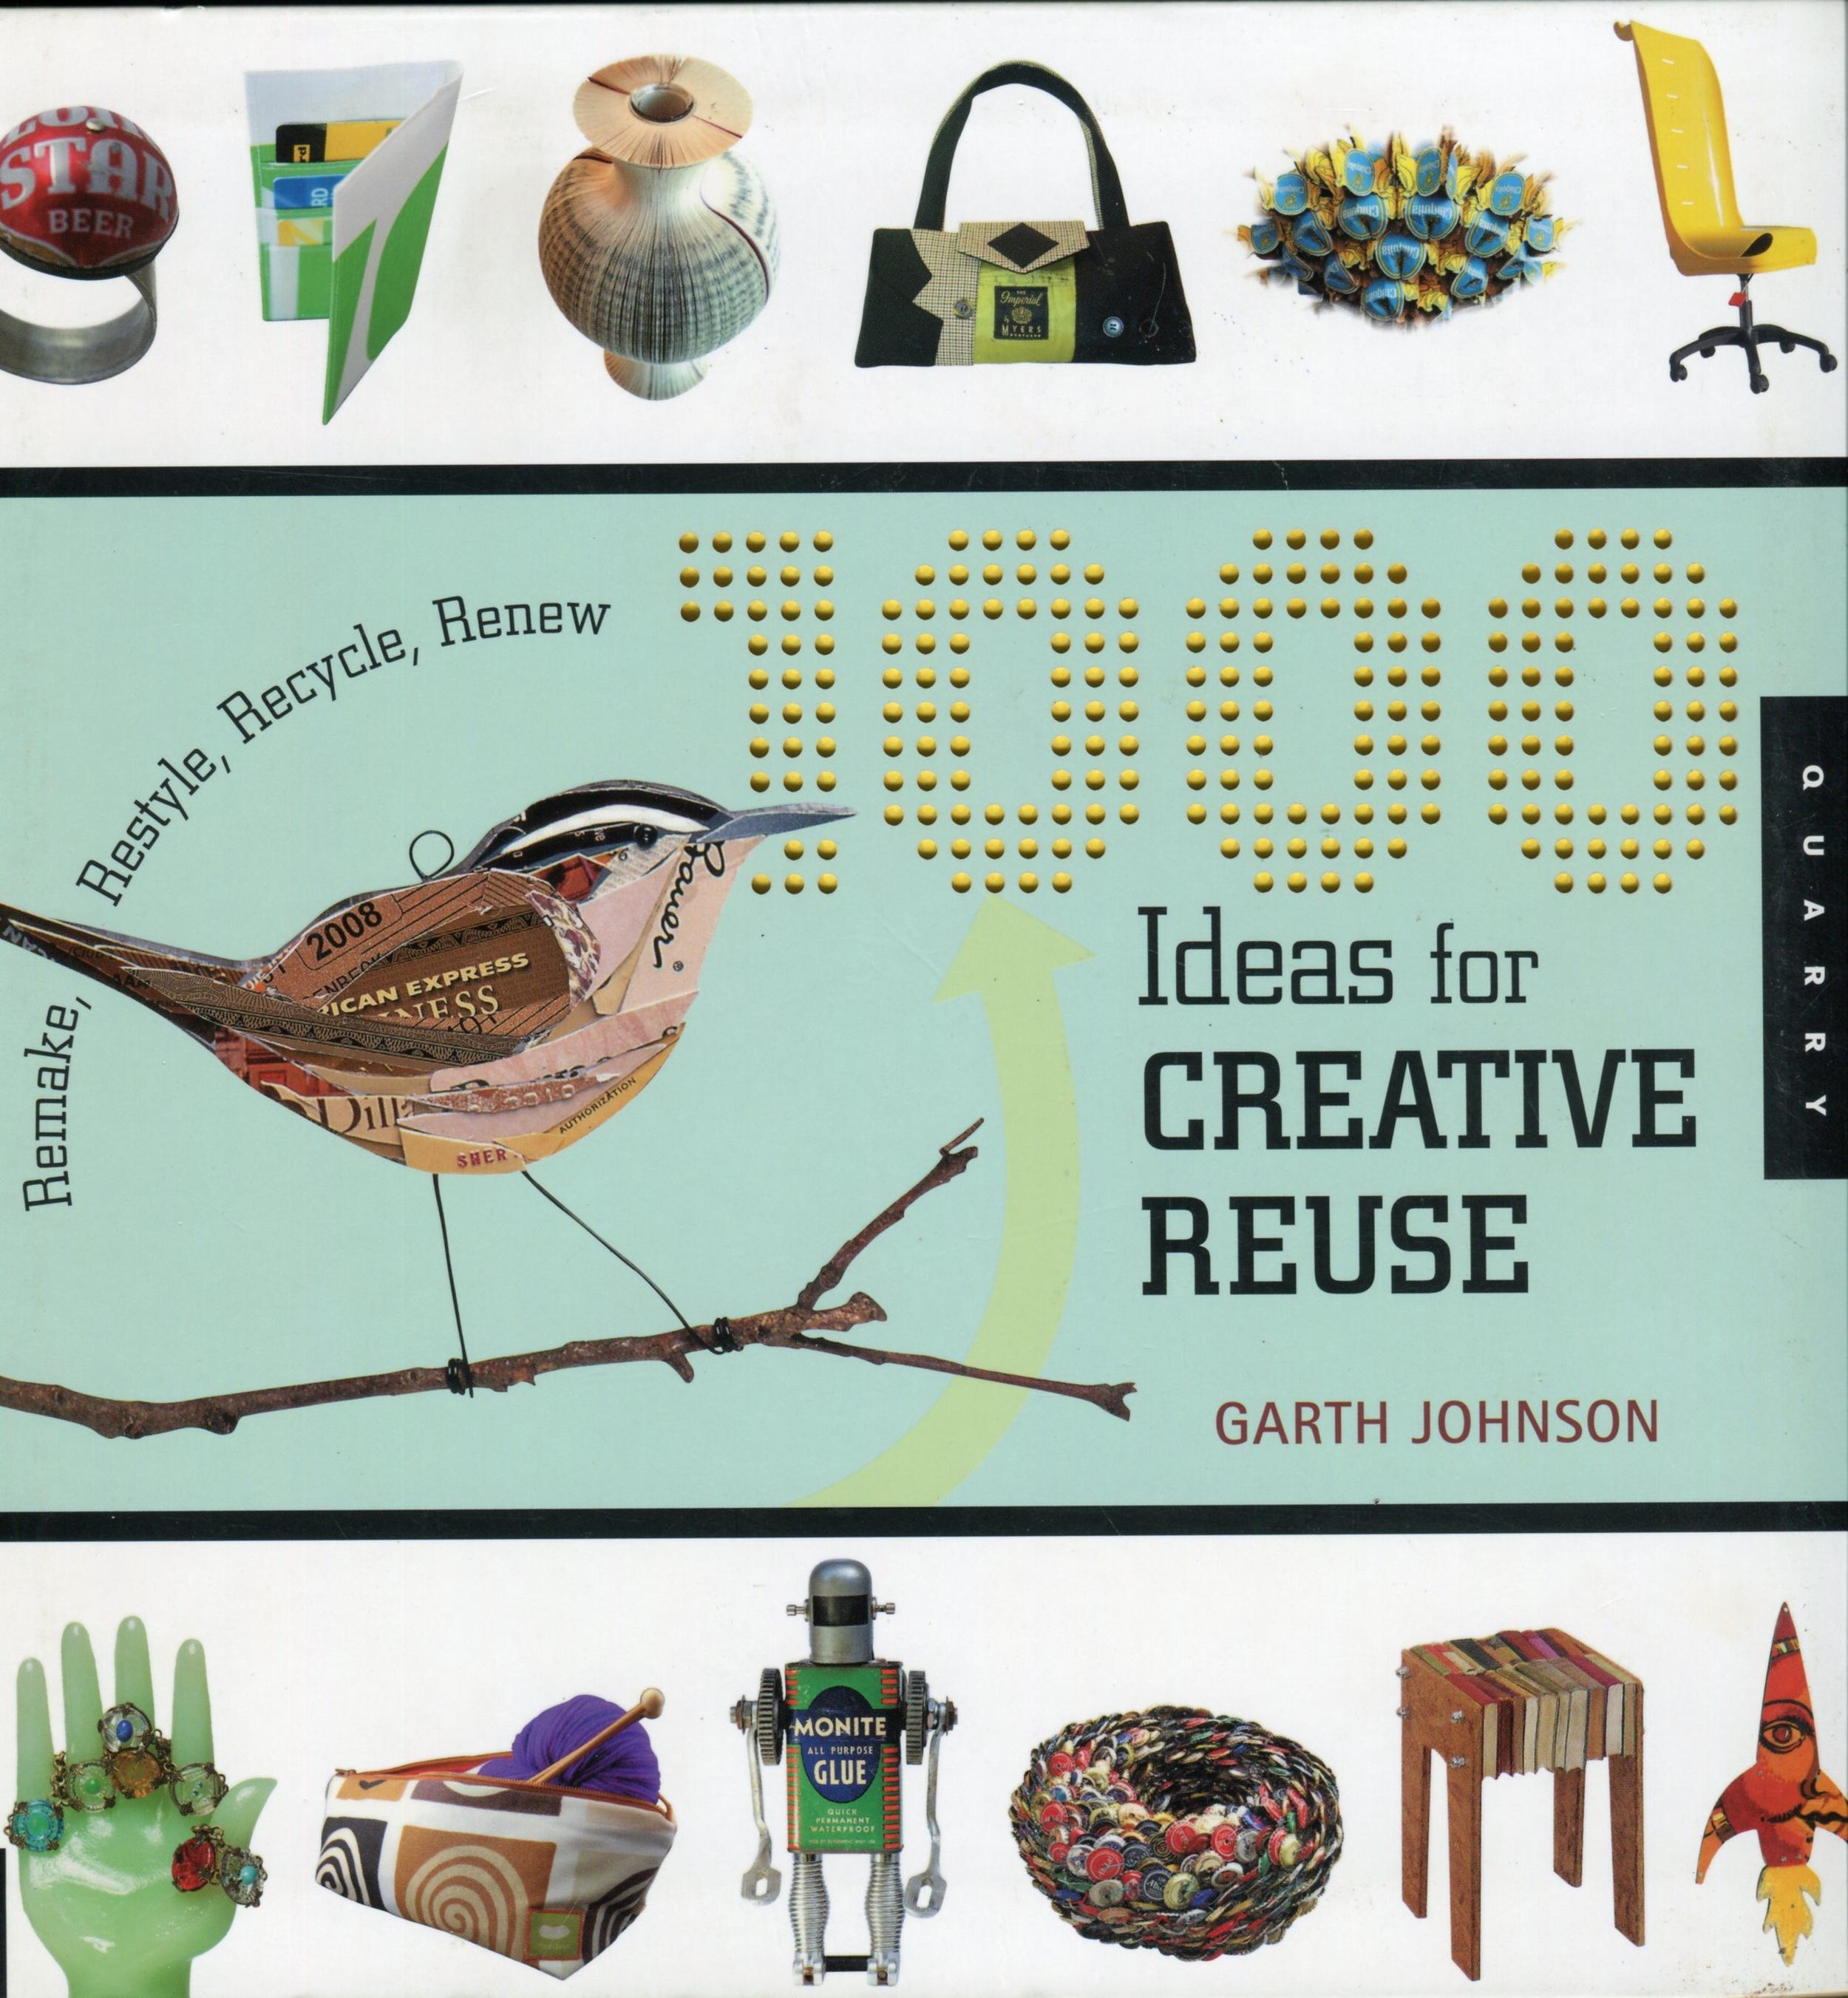 1000 Ideas for Creative Reuse, by Garth Johnson (cover).jpg